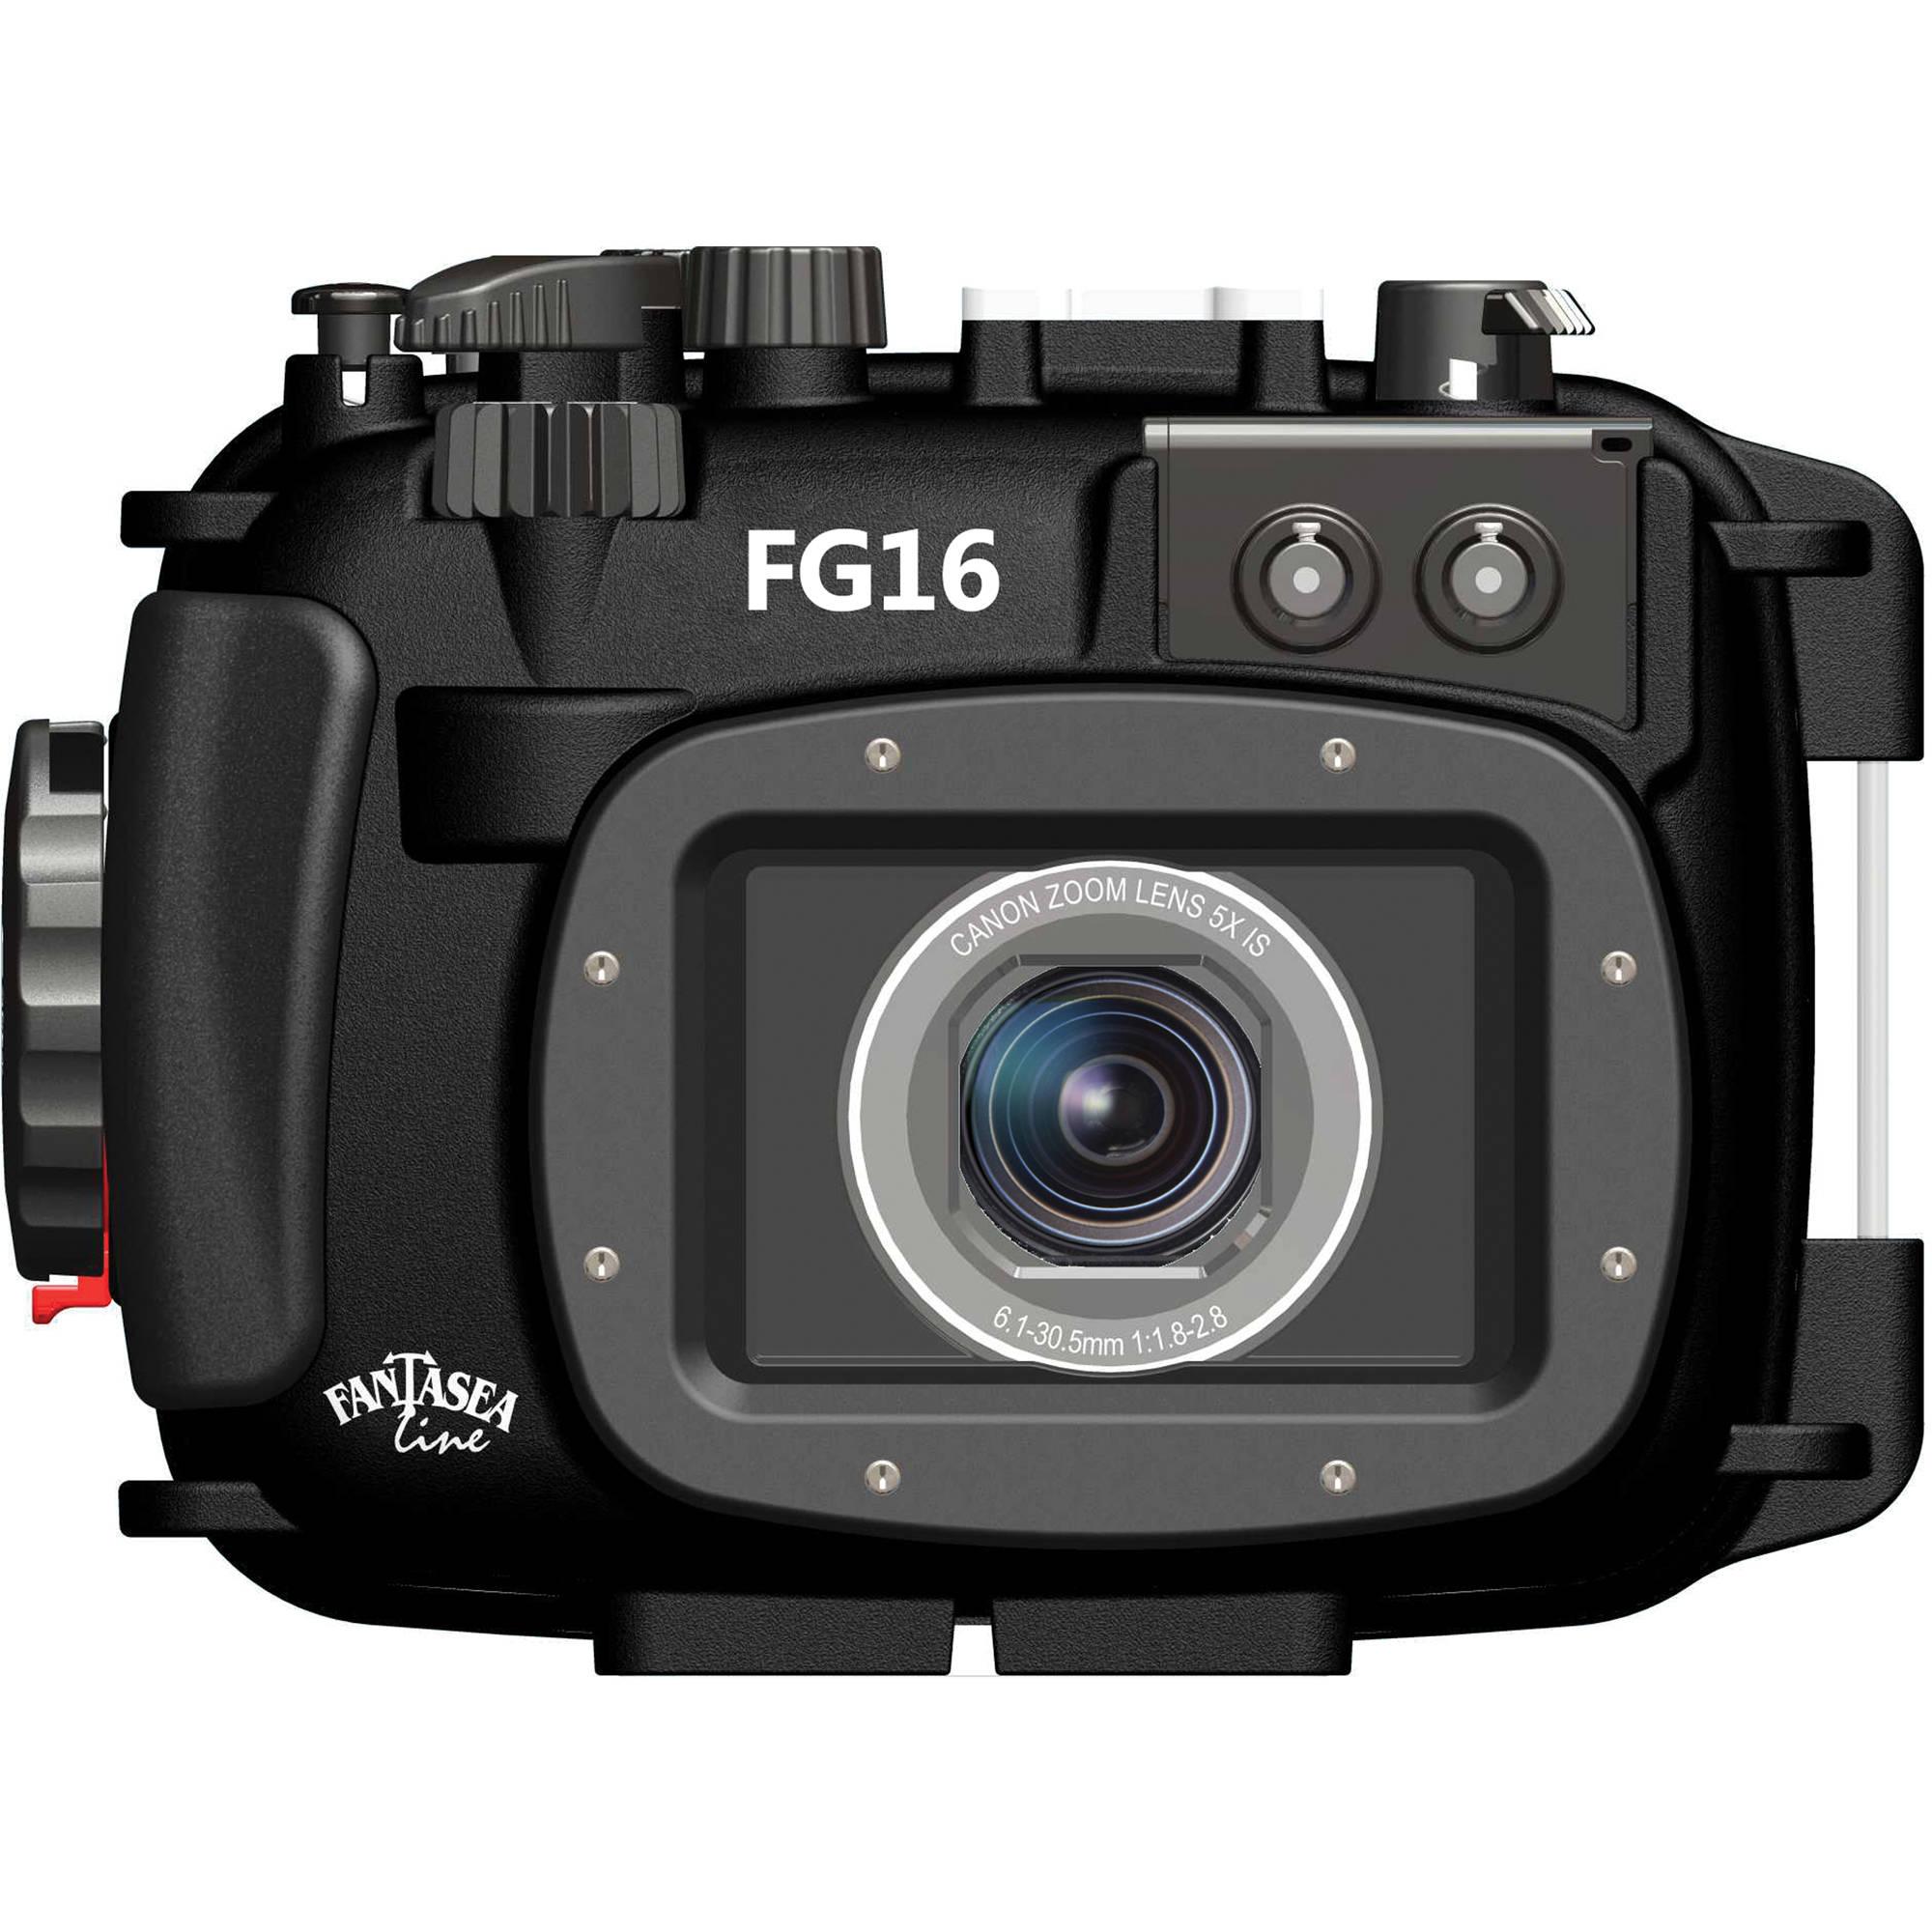 Line fg16 underwater housing for canon powershot g16 digital camera